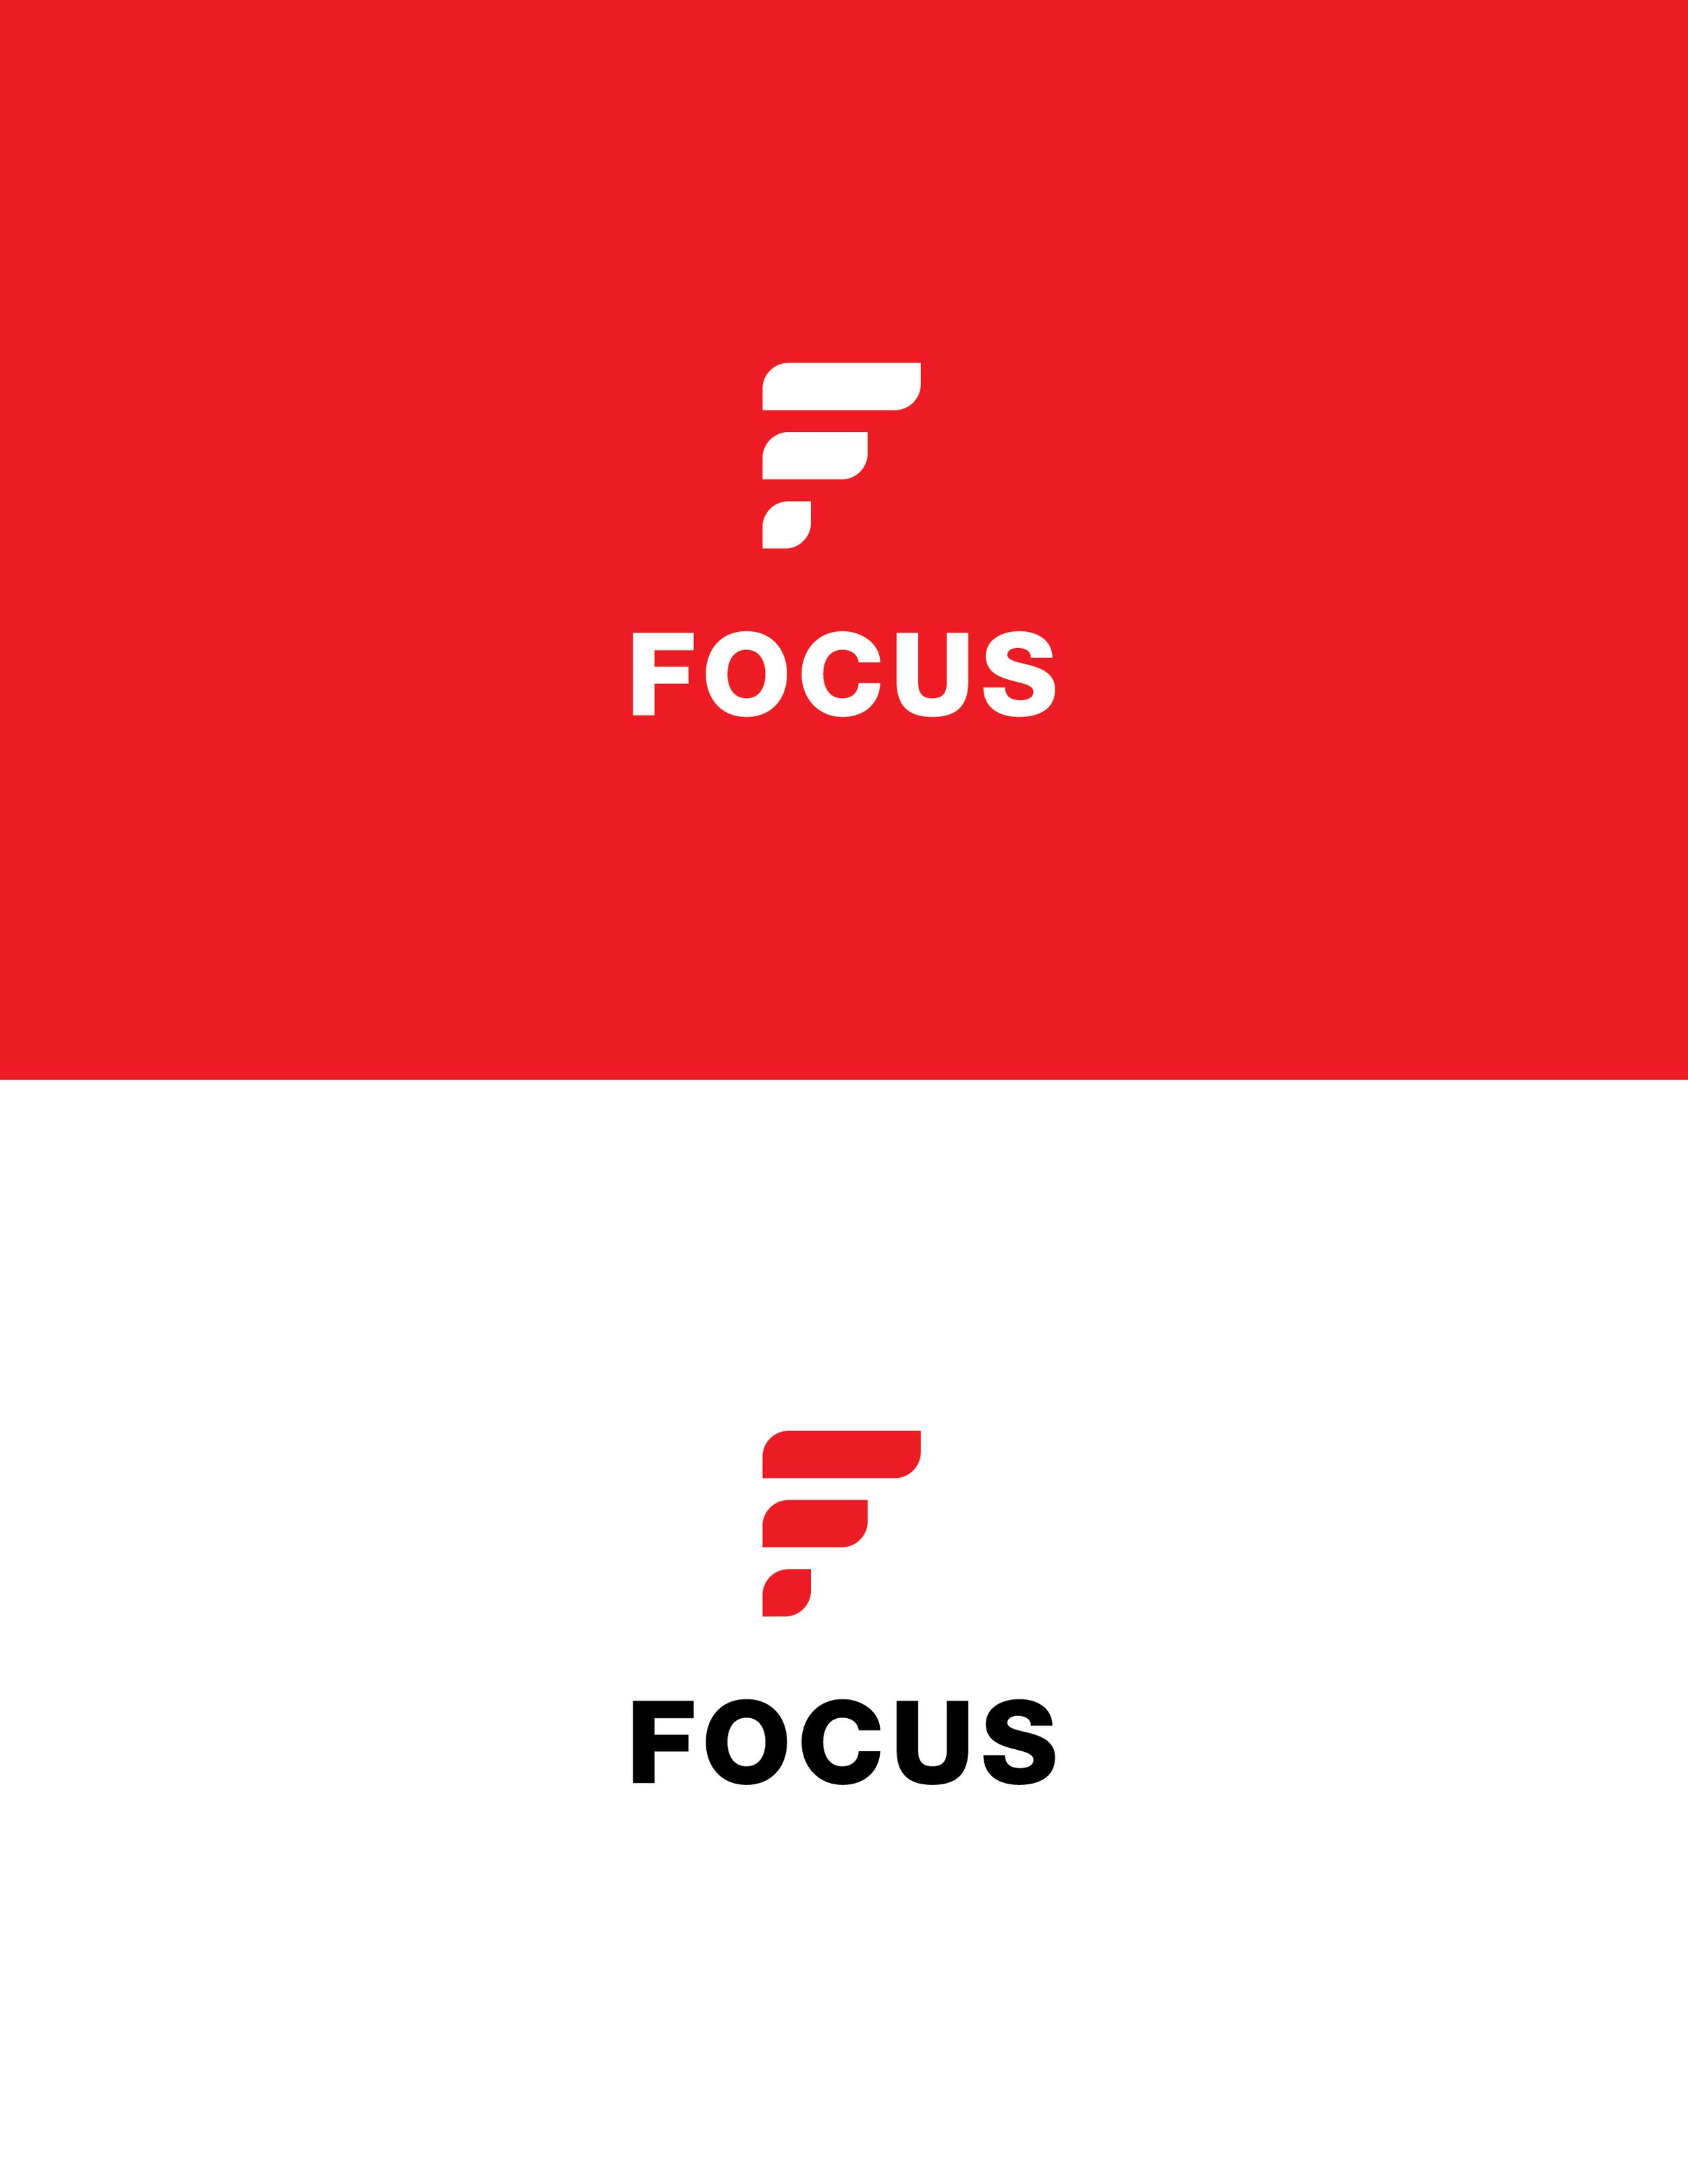 FOCUS_LOGO-02.jpg